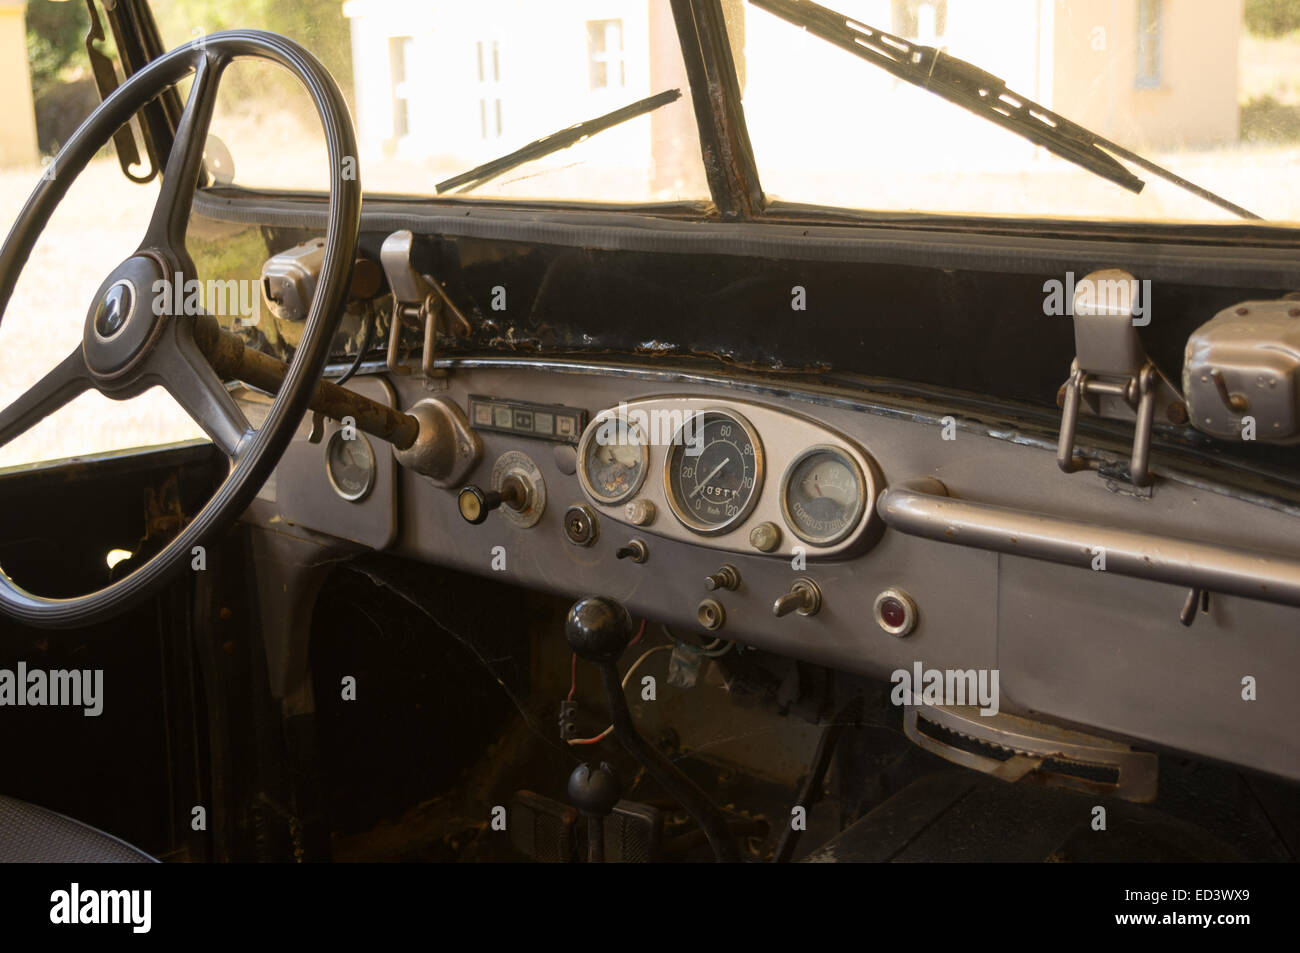 Instrumentation of a vintage Italian car - Stock Image